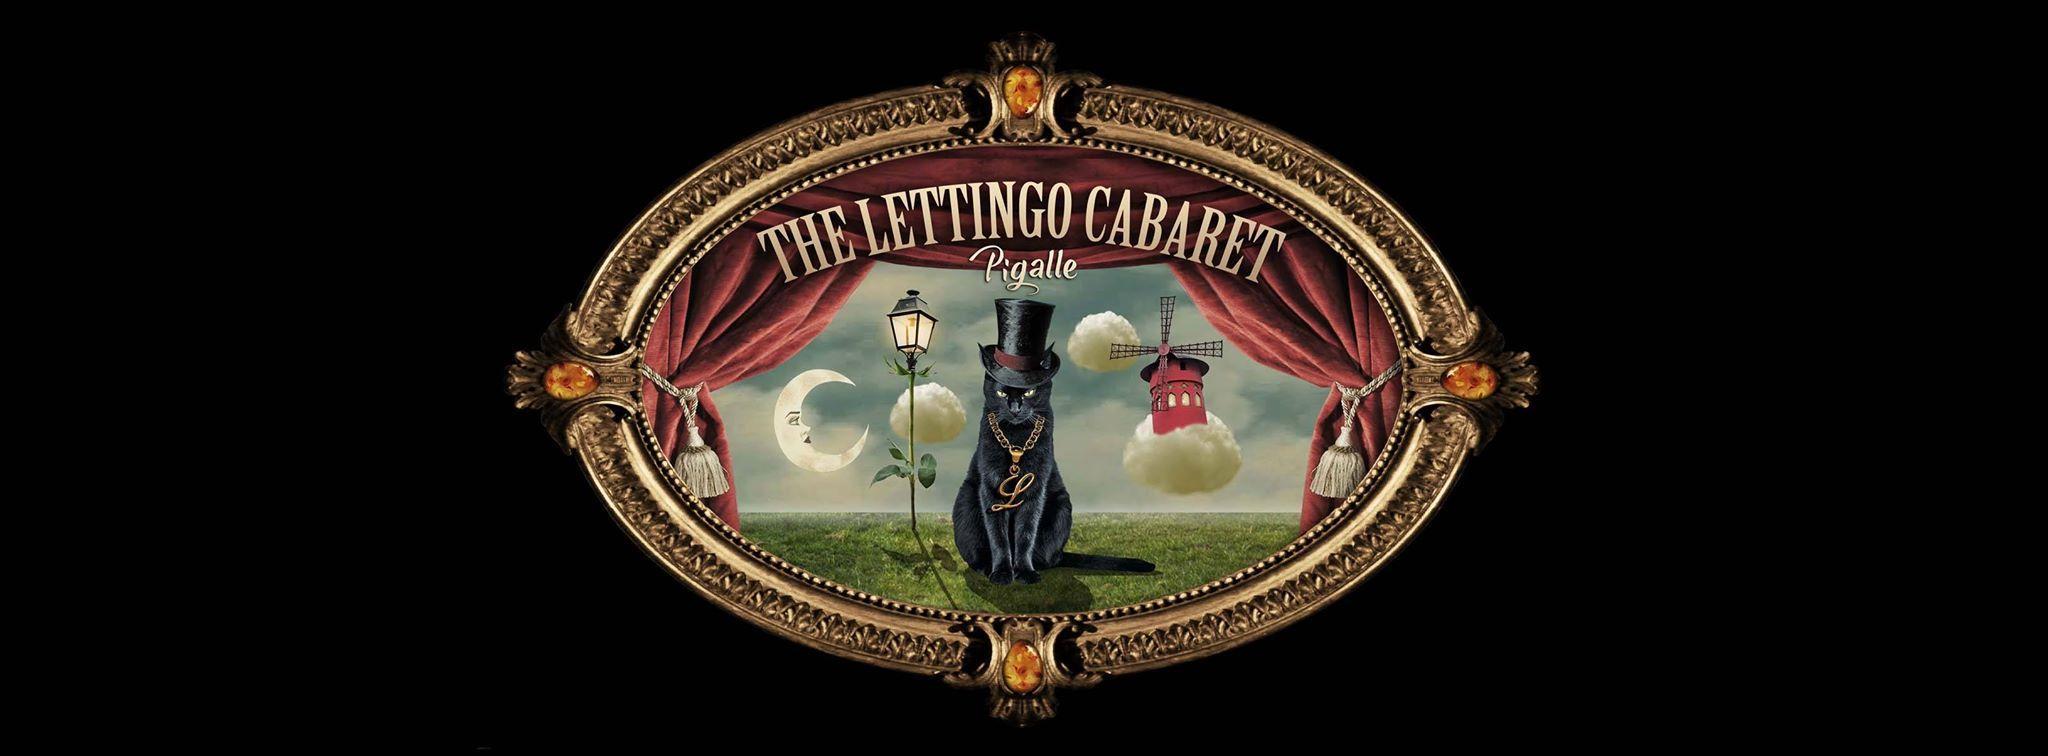 http://www.thelettingocabaret.com/